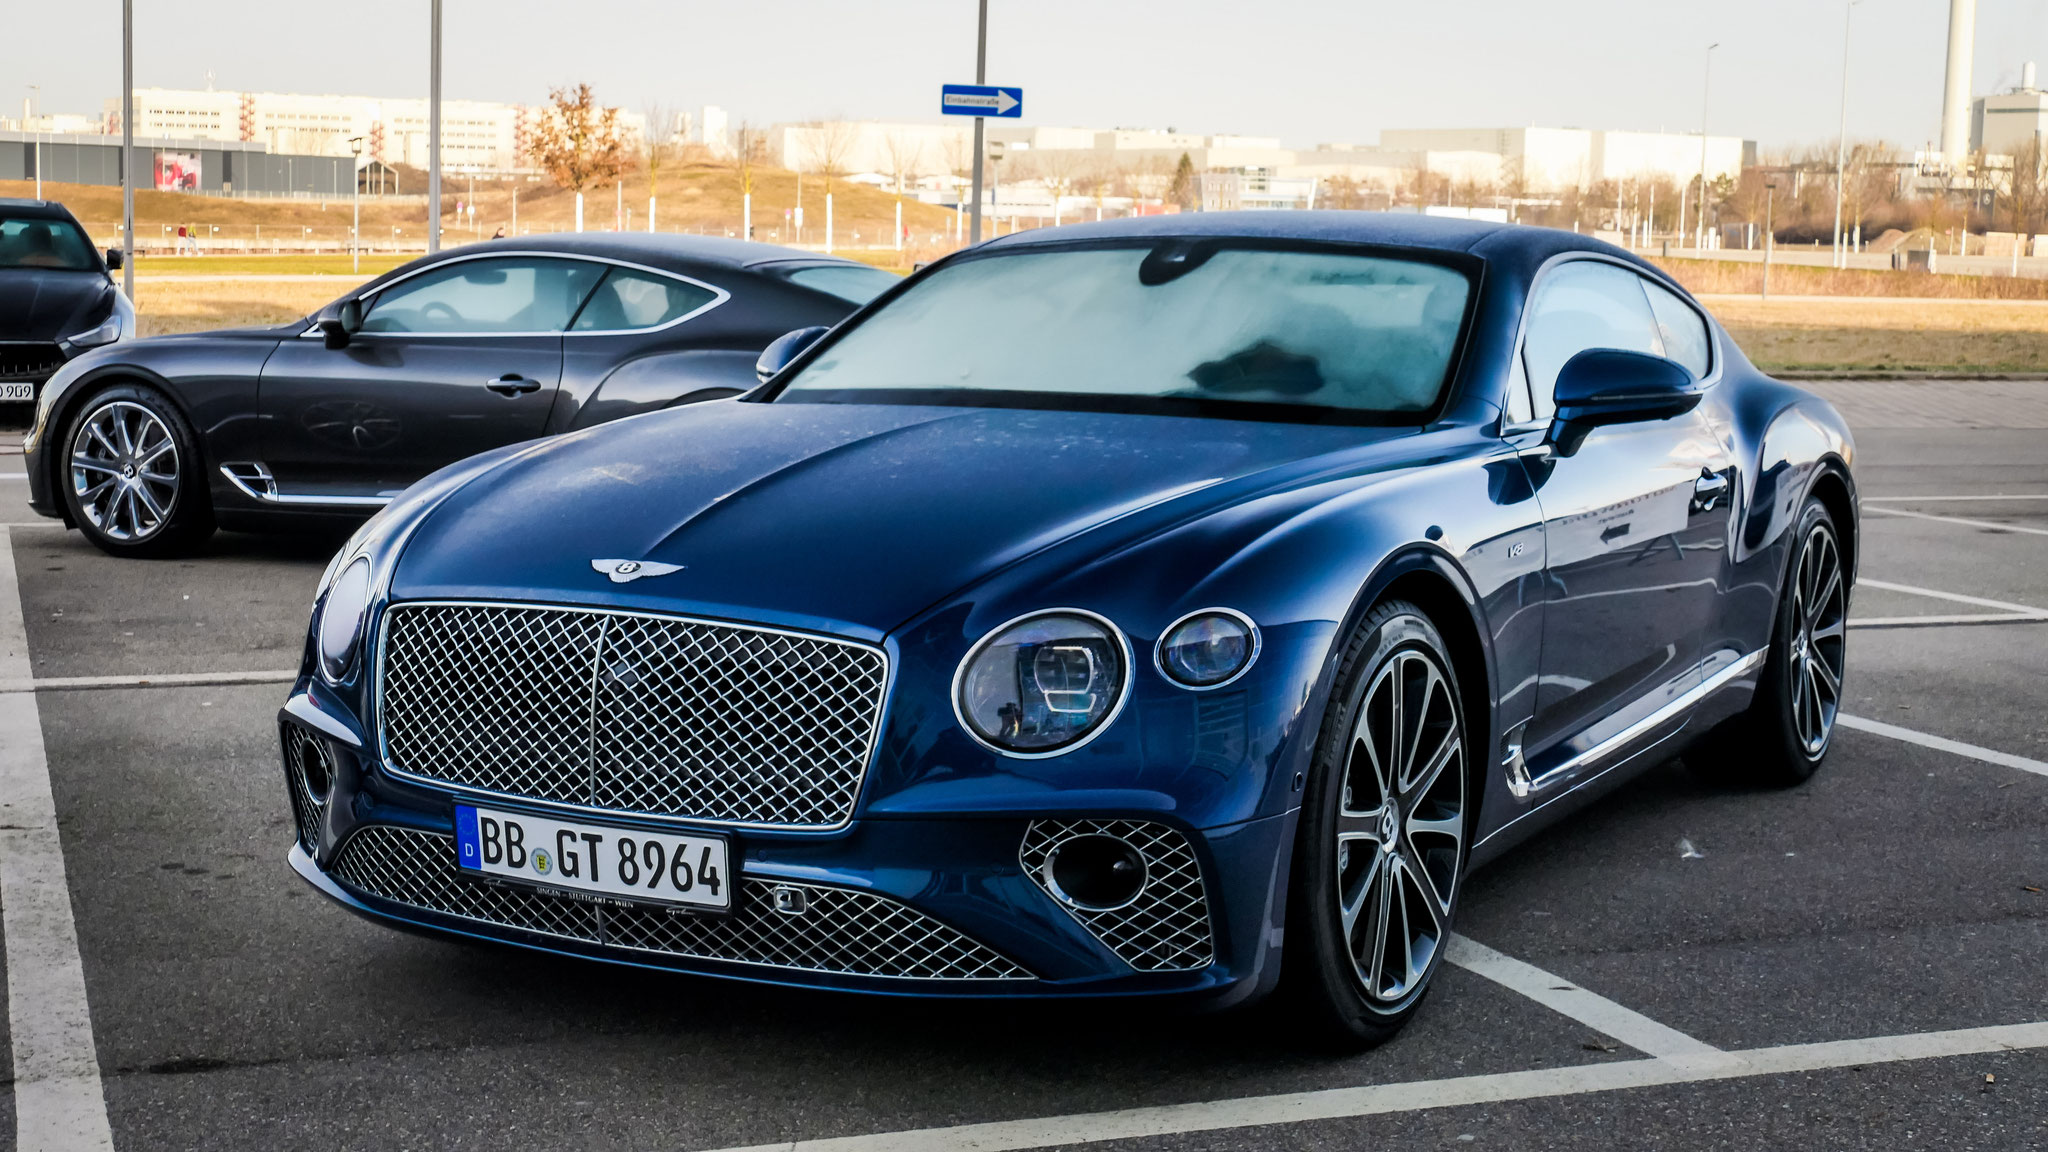 Bentley Continental GT - BB-GT-8964